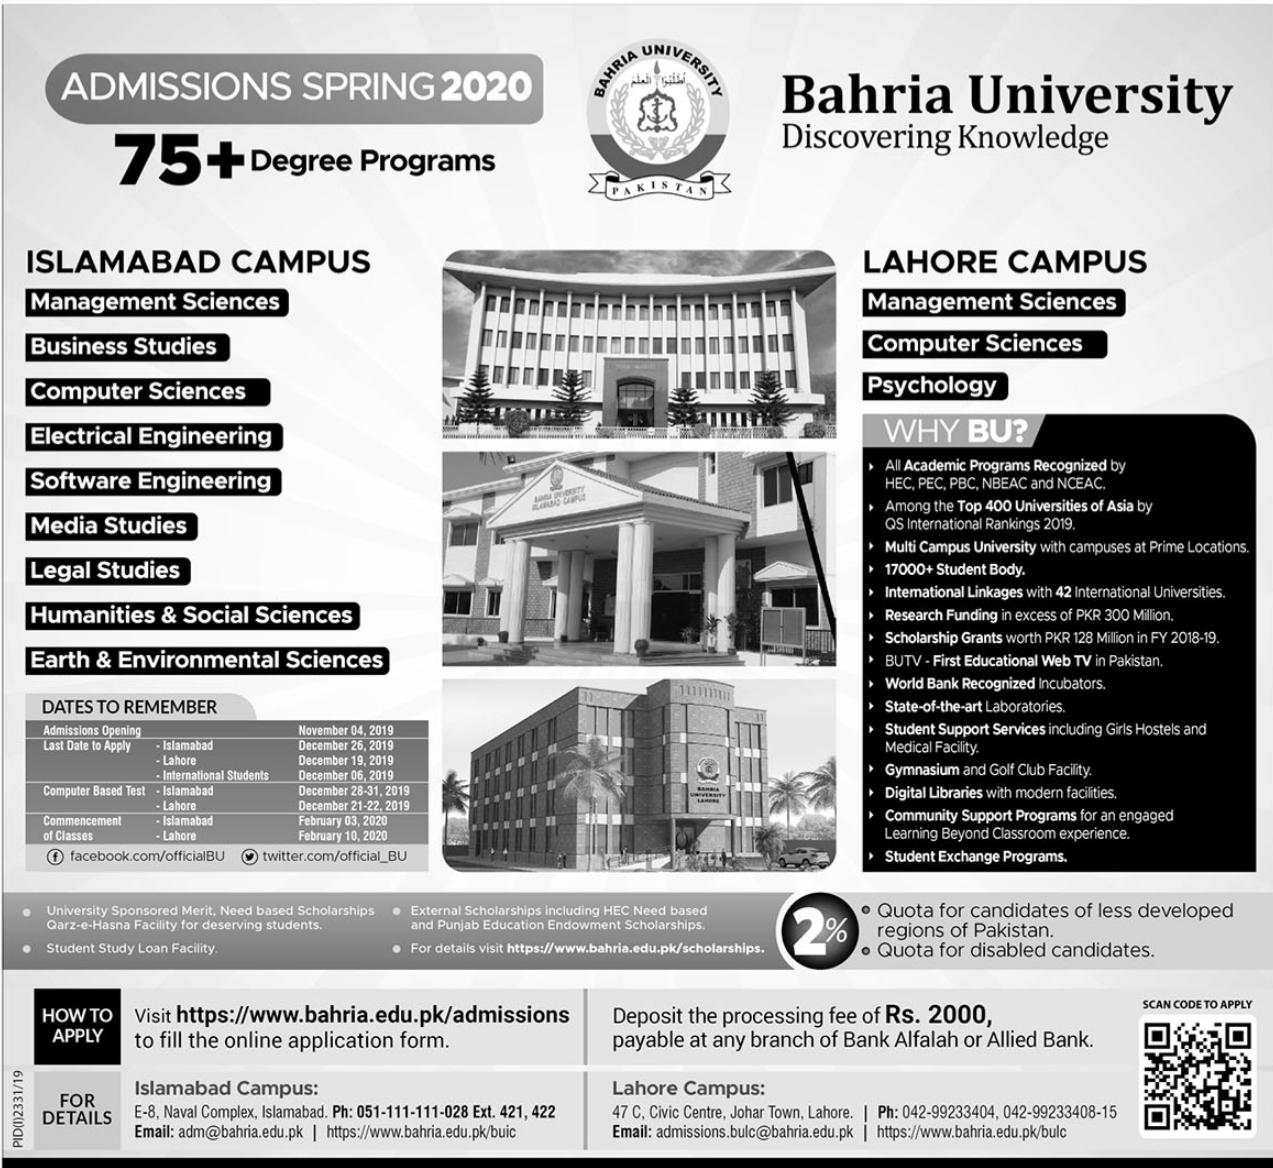 Bahria University Legal Studies Admissions Fall 2019-2020